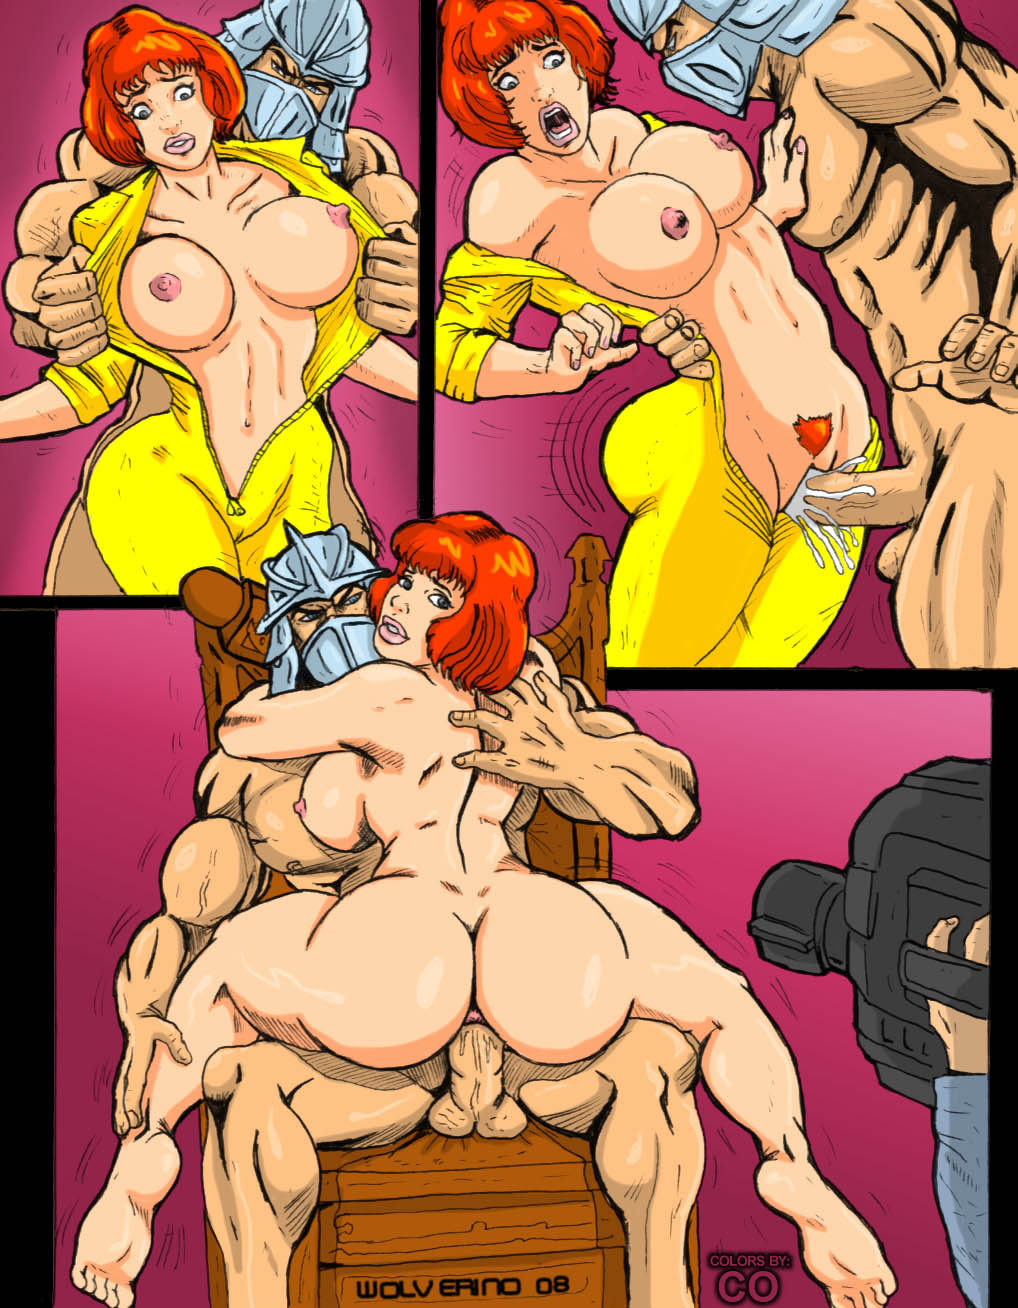 kurortnoe-porno-foto